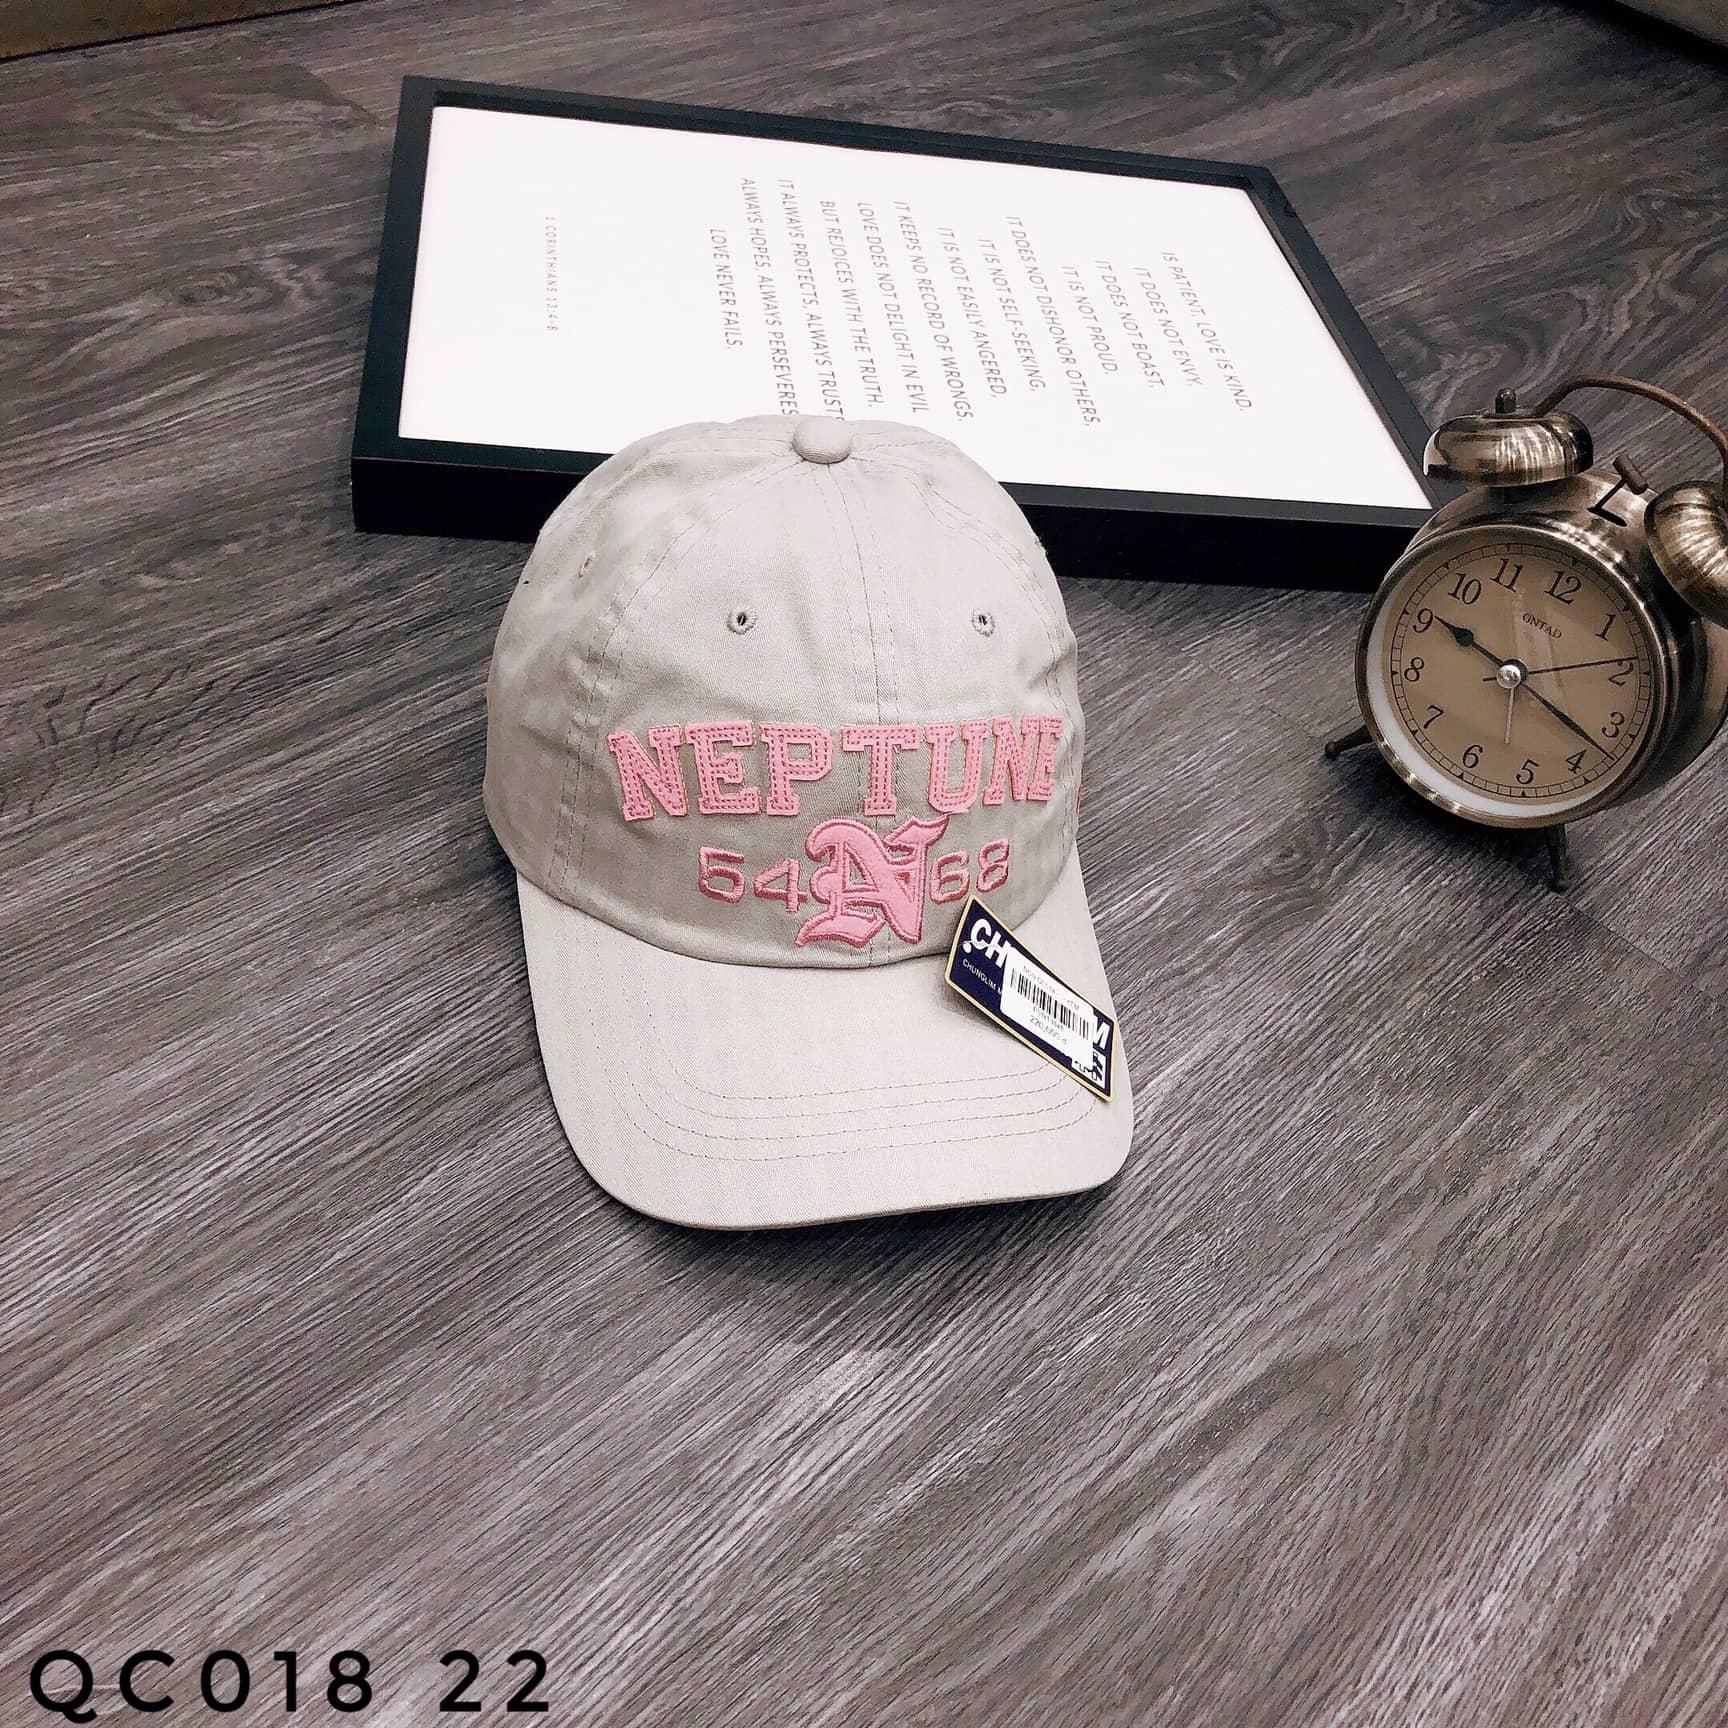 NÓN QC018